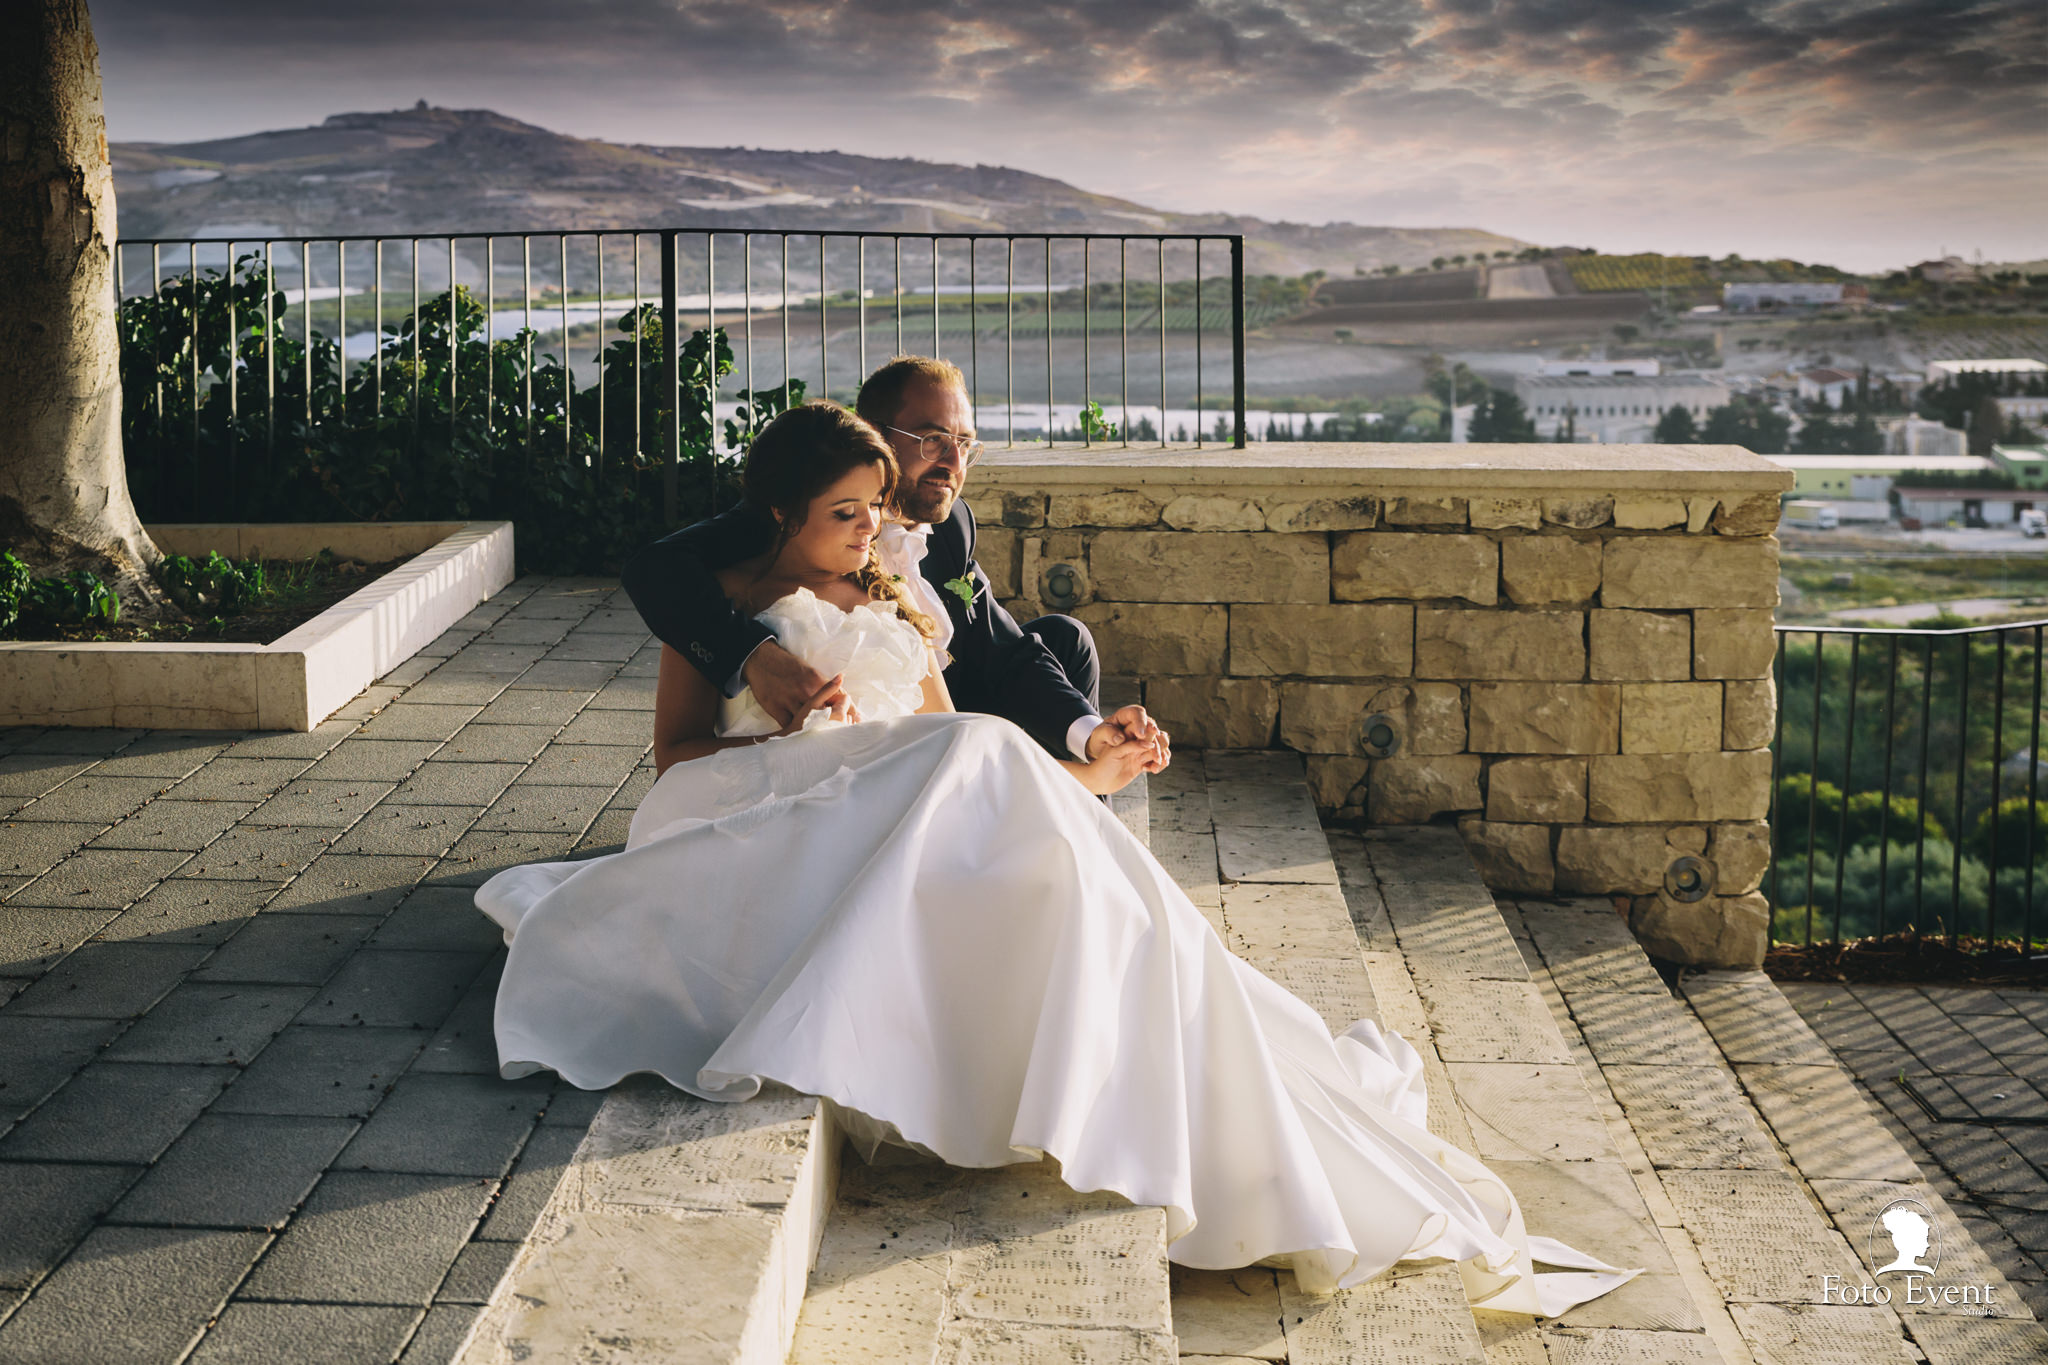 045-2020-10-15-Matrimonio-Noemi-e-Salvatore-Paterno-5DE-1800-Edit